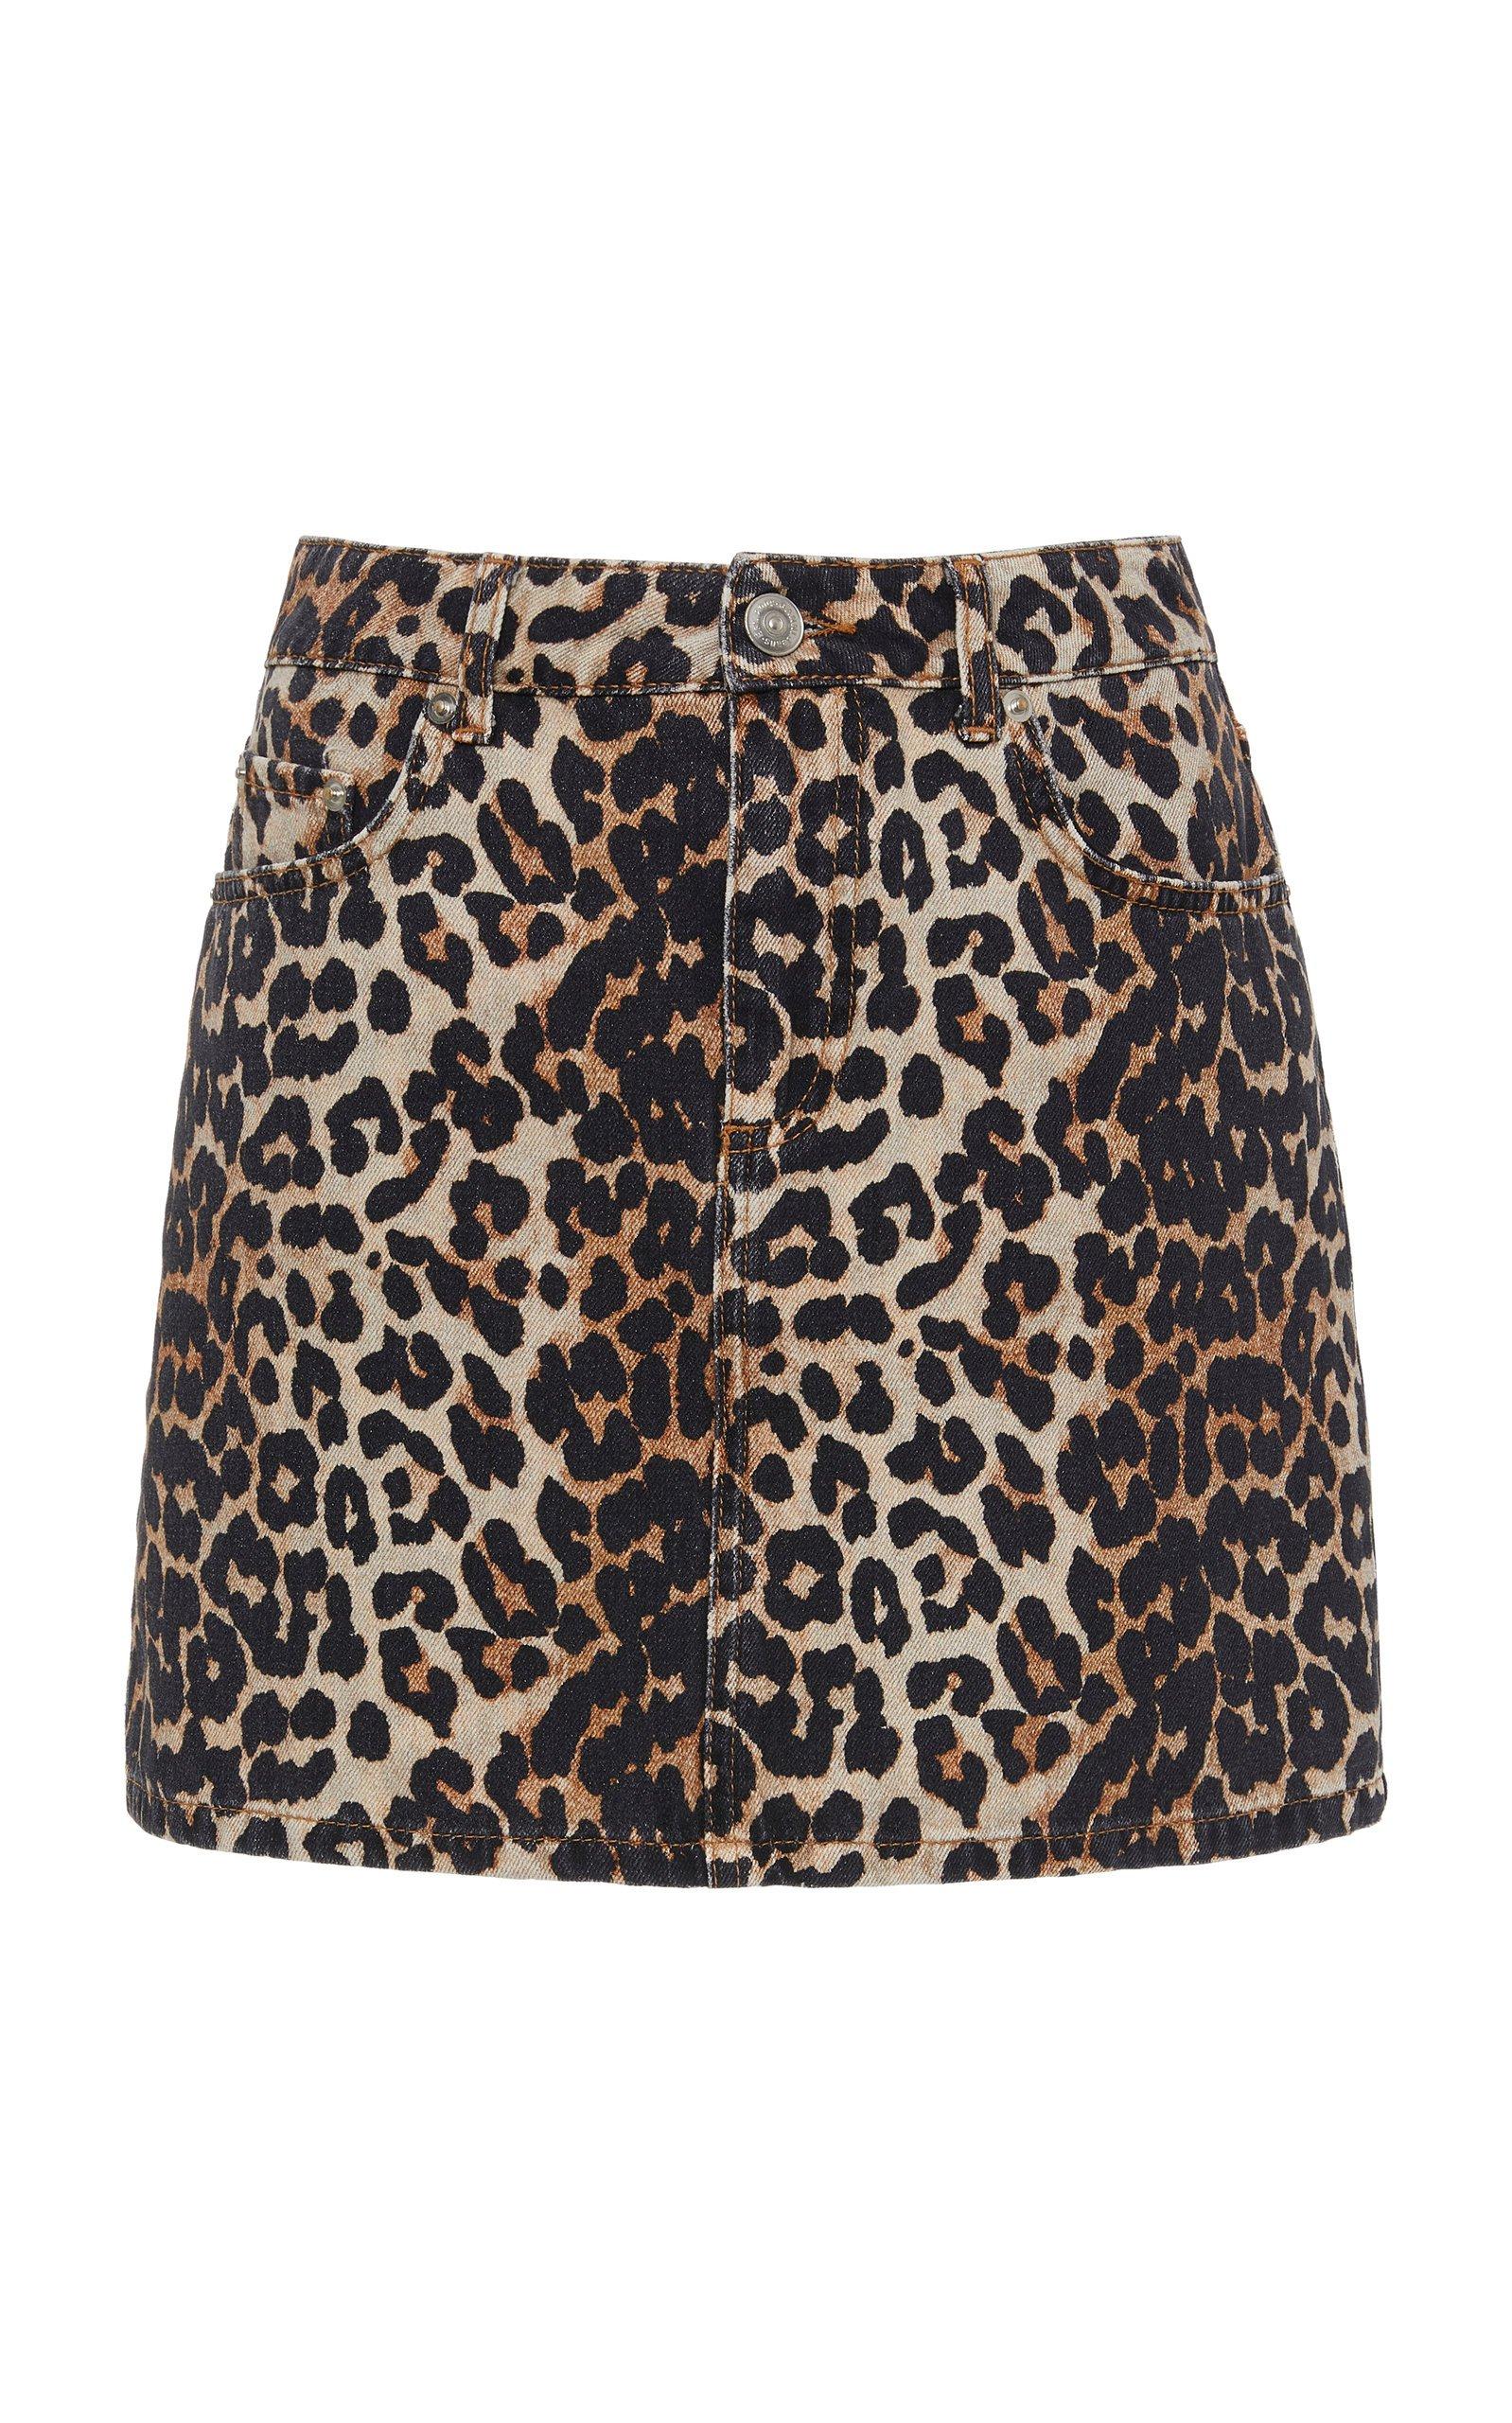 Ganni Leopard-Print Denim Mini Skirt Size: 40